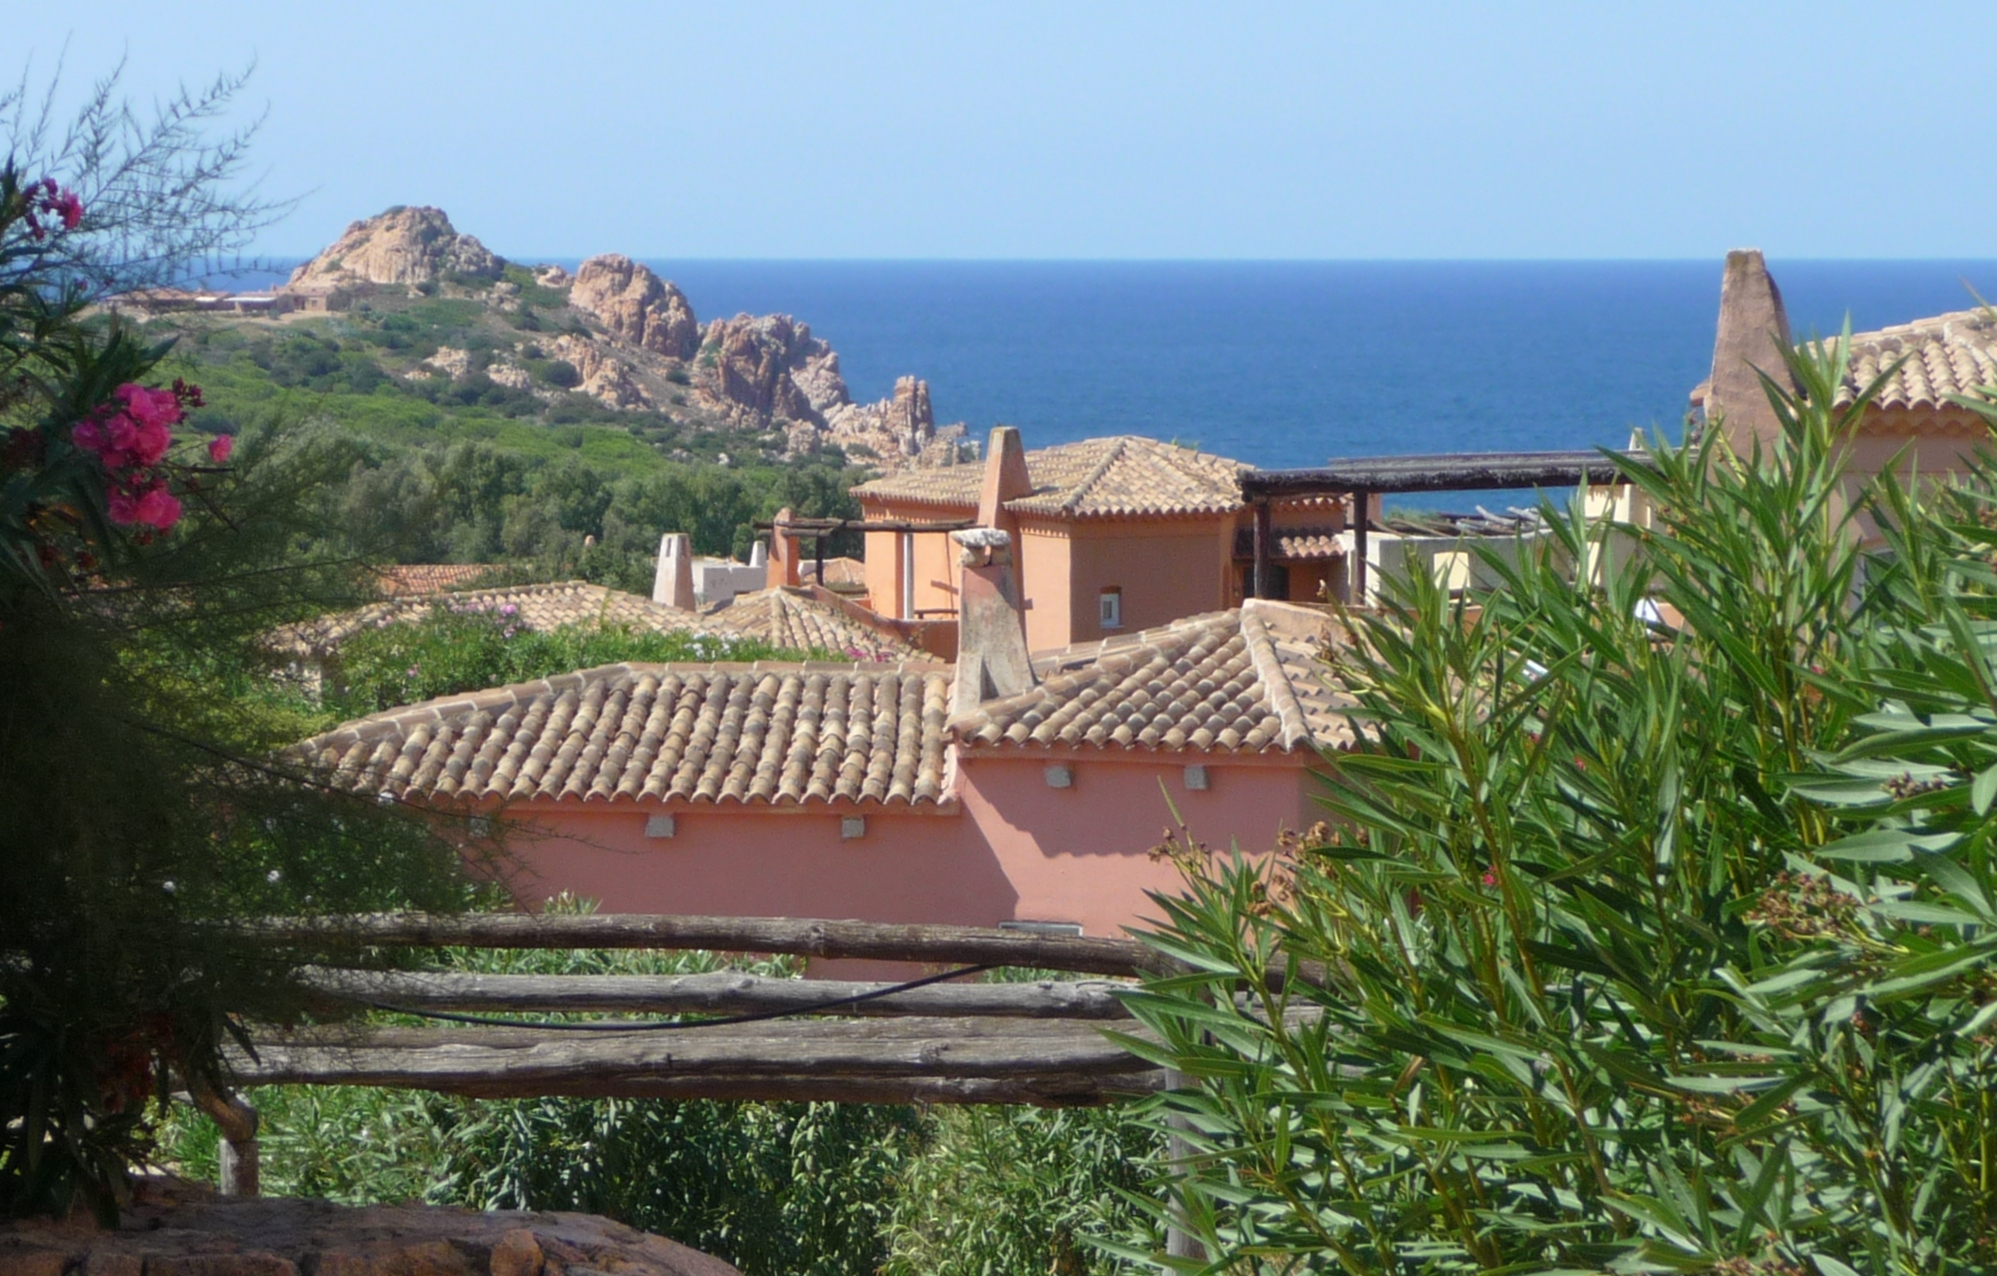 Ferienwohnung Cottage-Apartment On The Coast Surrounded By Unspoilt Nature (2230692), Canneddi, Olbia-Tempio, Sardinien, Italien, Bild 3